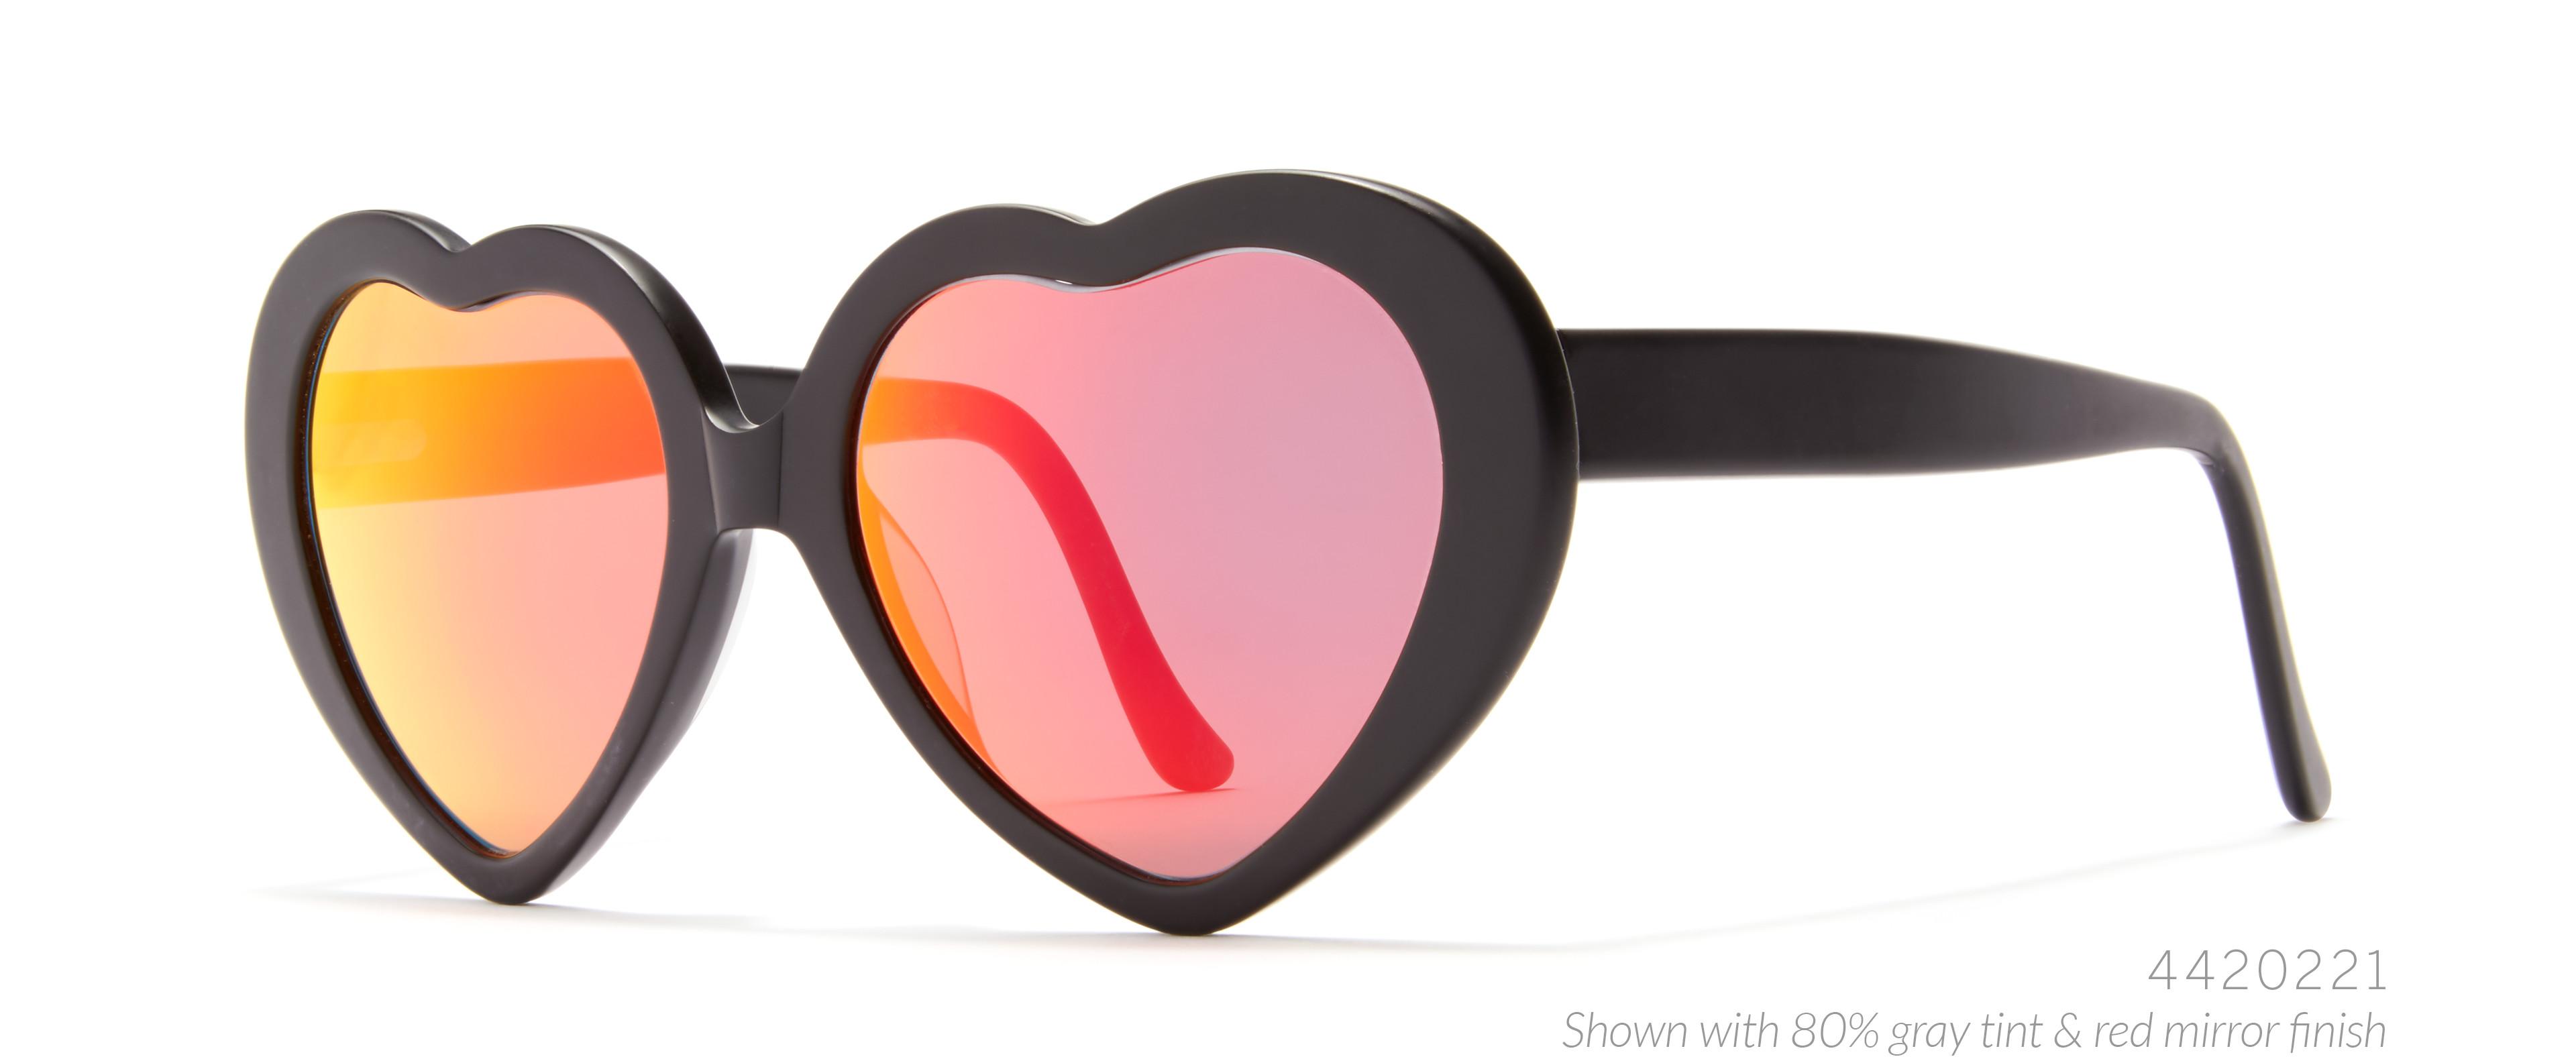 black-heart-sunglasses-4420221-tq